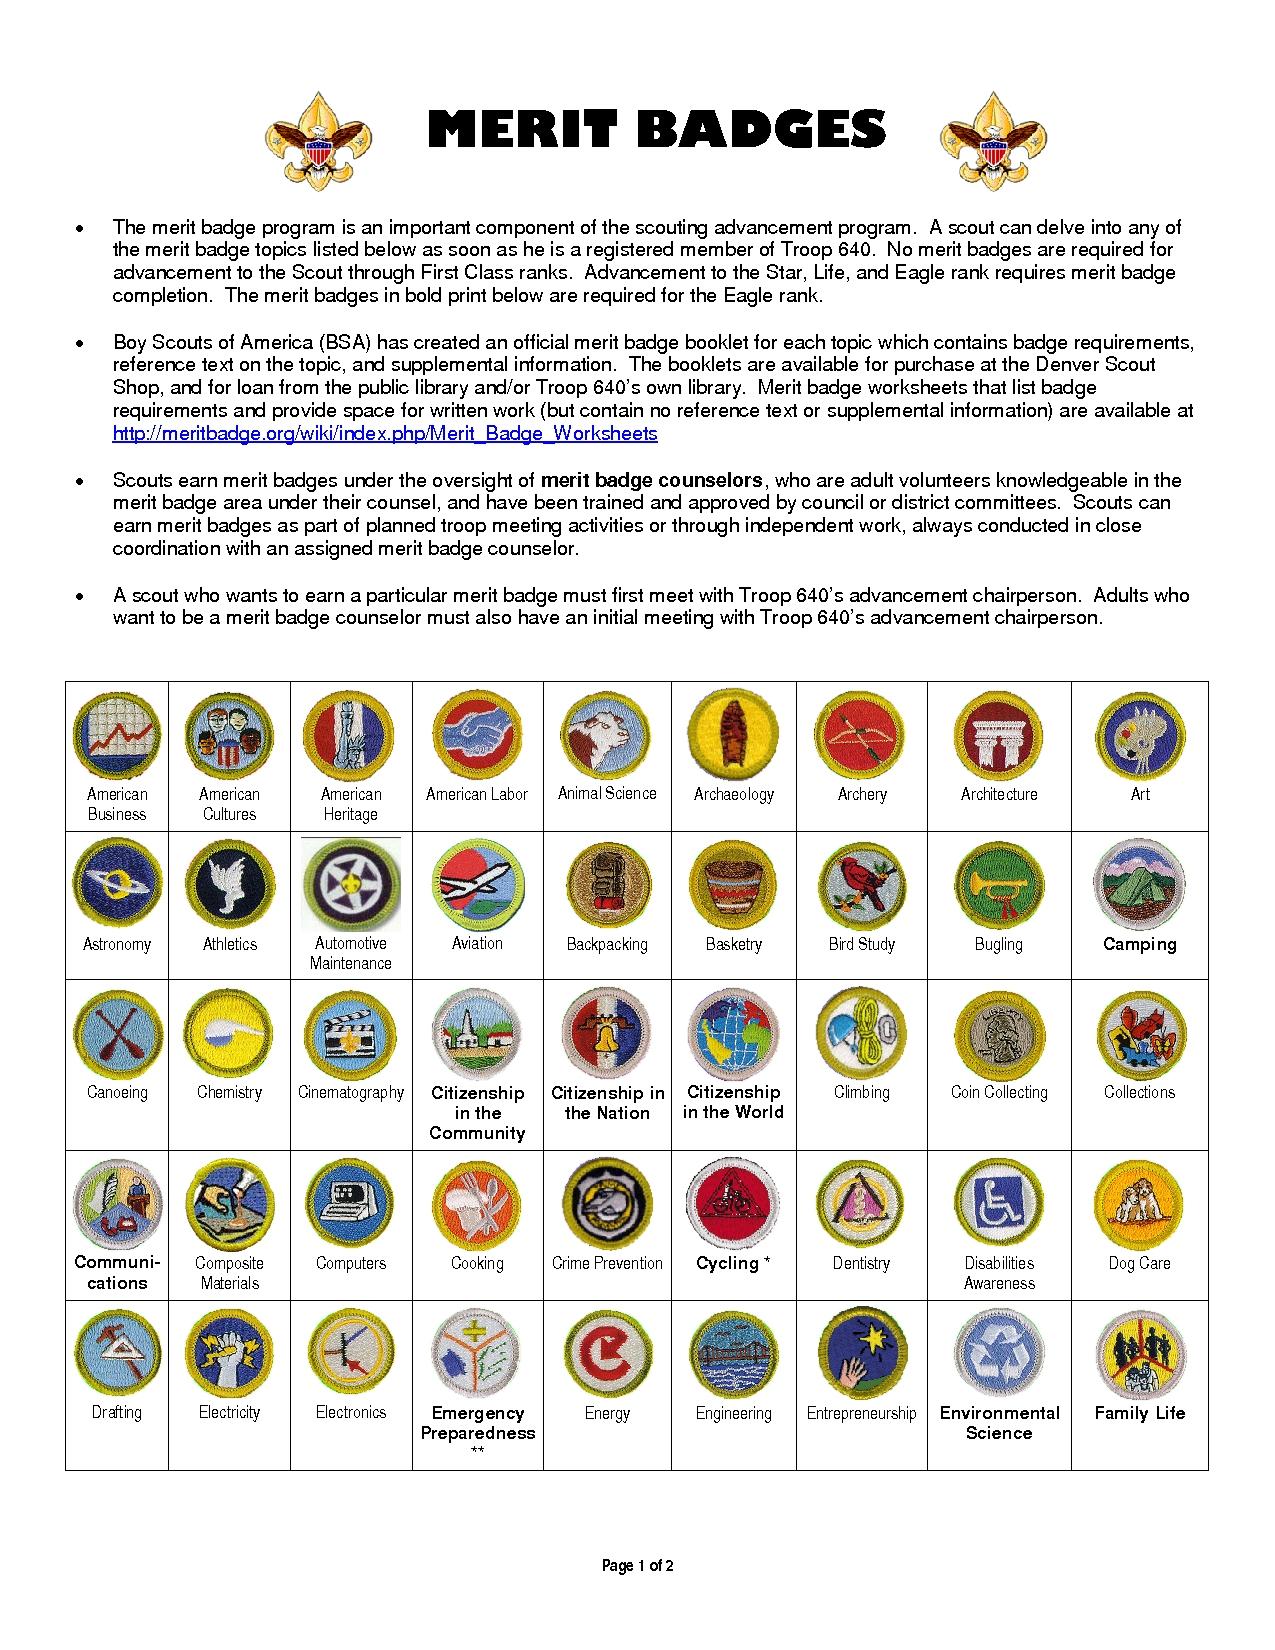 10 Gorgeous Family Life Merit Badge Project Ideas boy scout merit badges diy crafts pinterest merit badge 2020